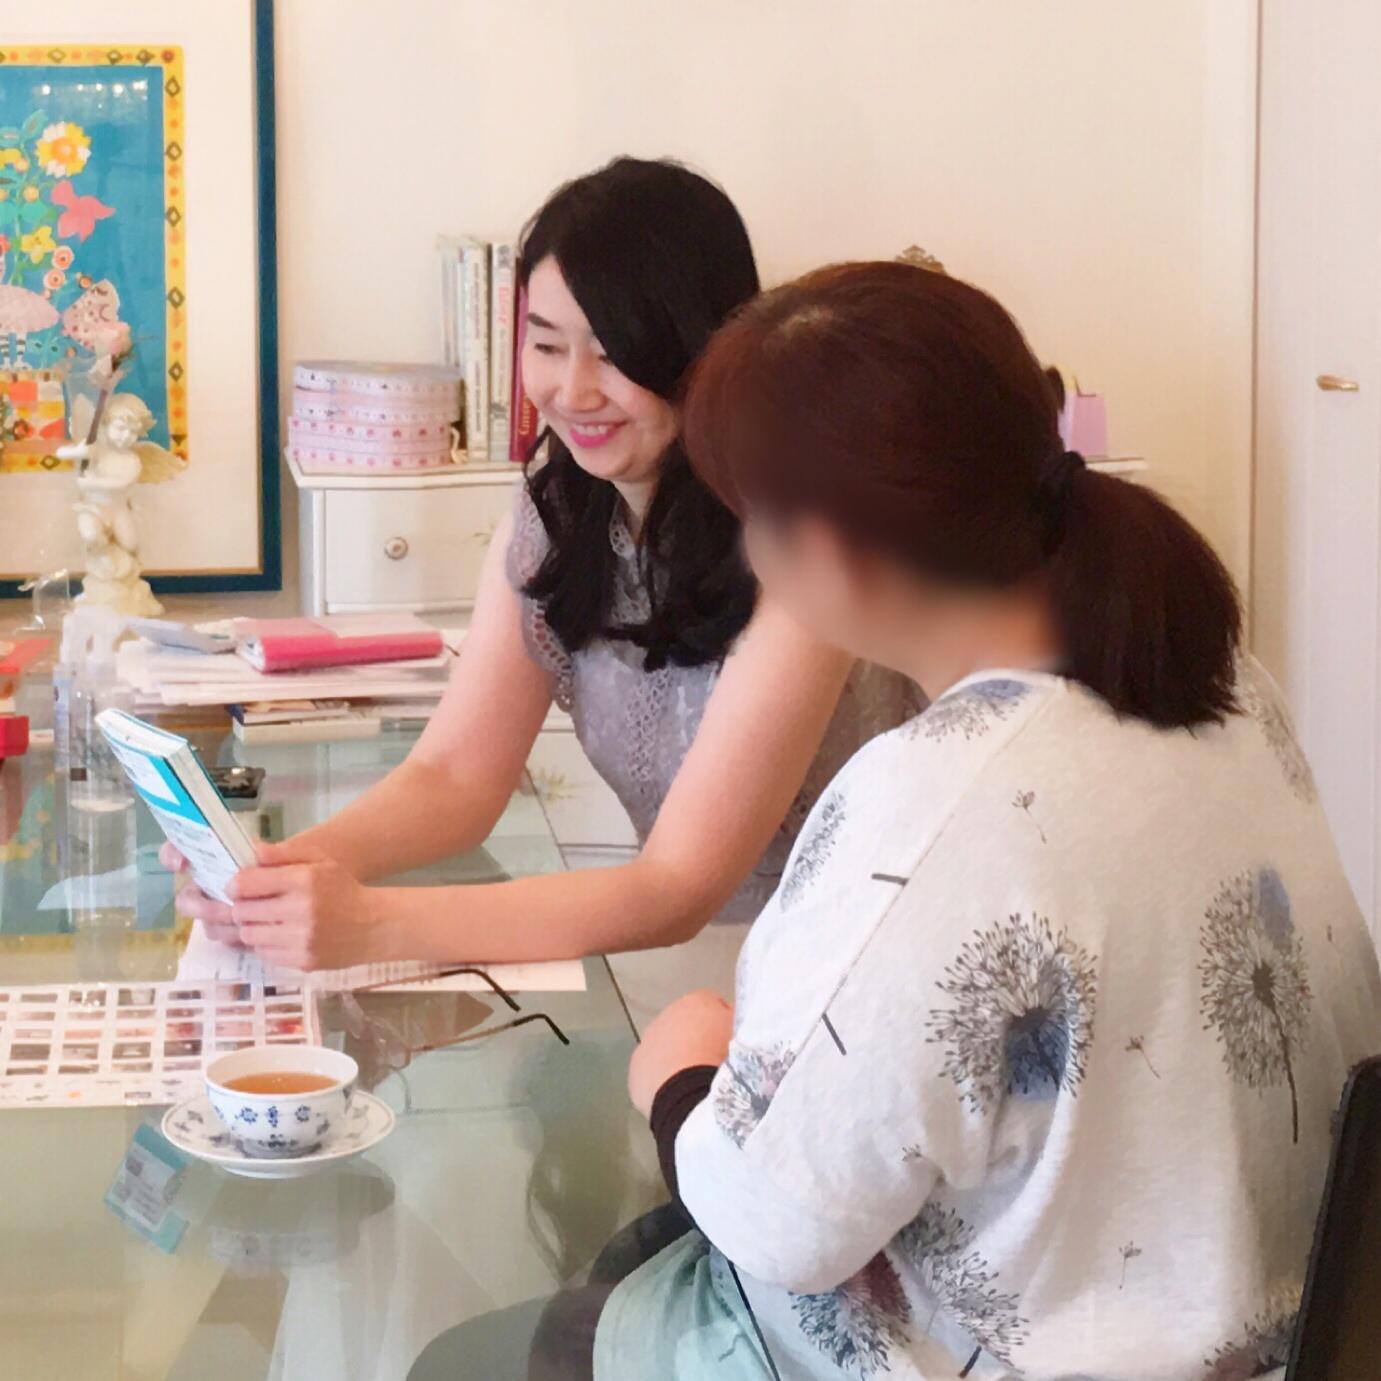 催眠療法,トラウマ,潜在意識,大阪